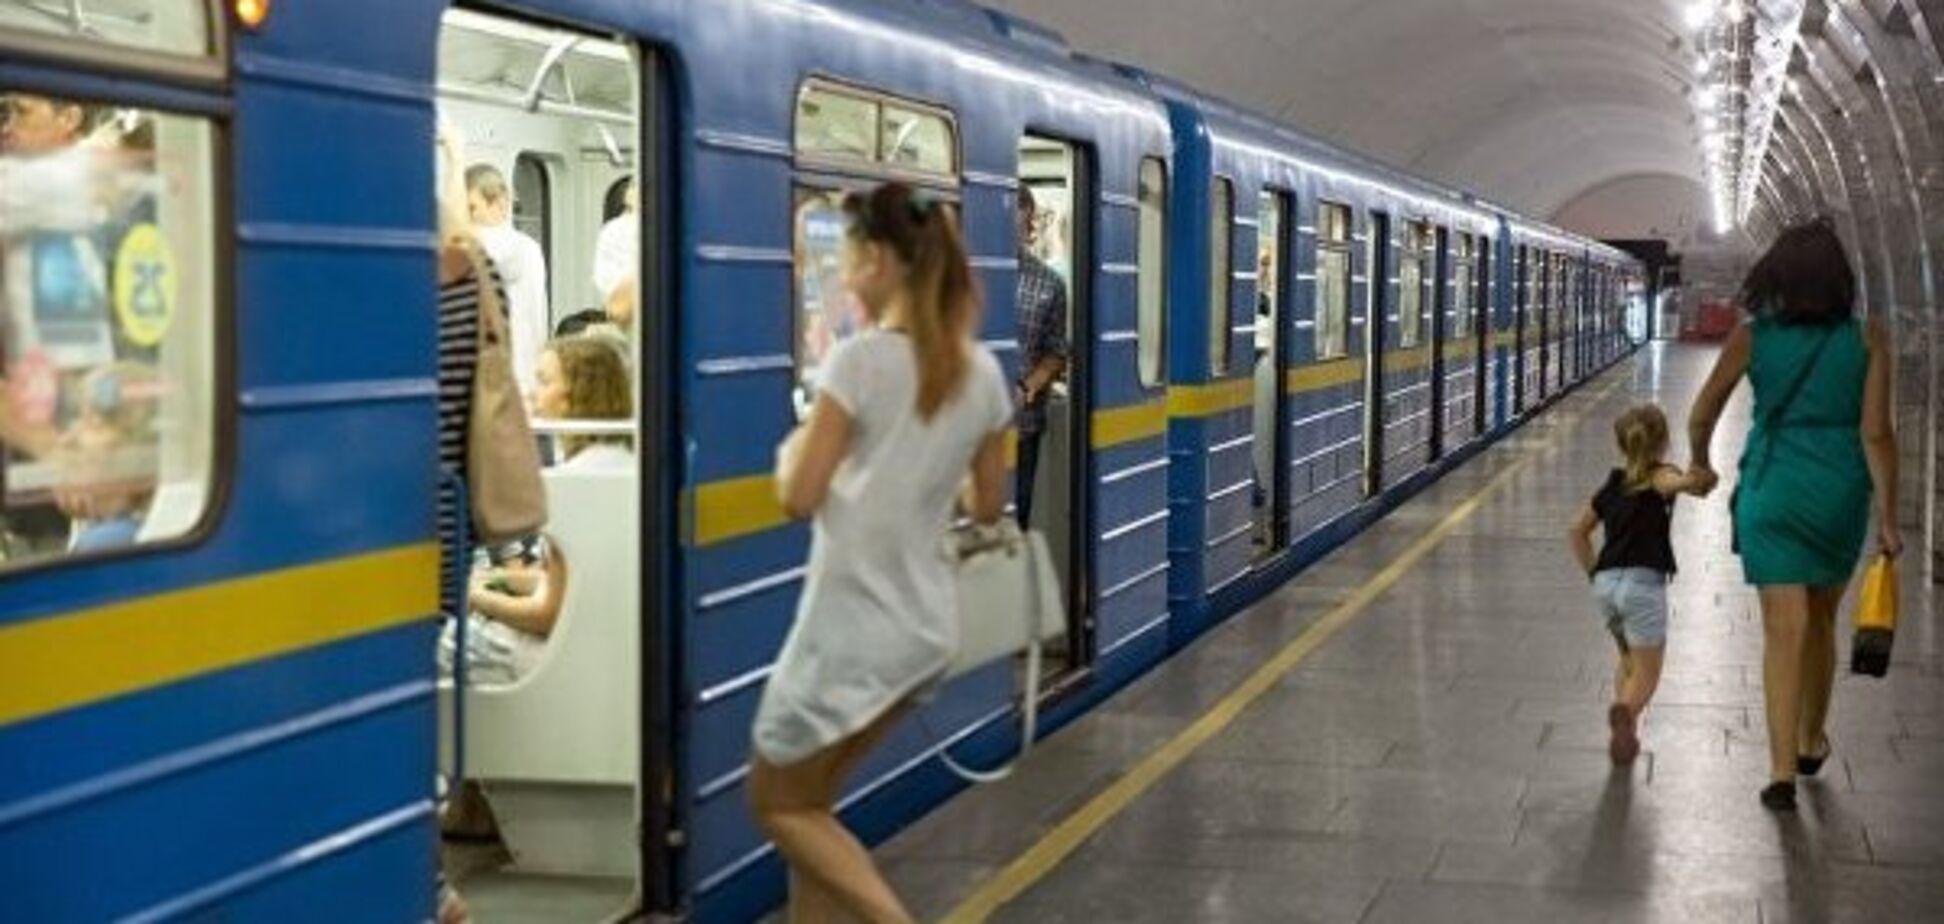 Екстремалки в метро Києва налякали пасажирів: відео